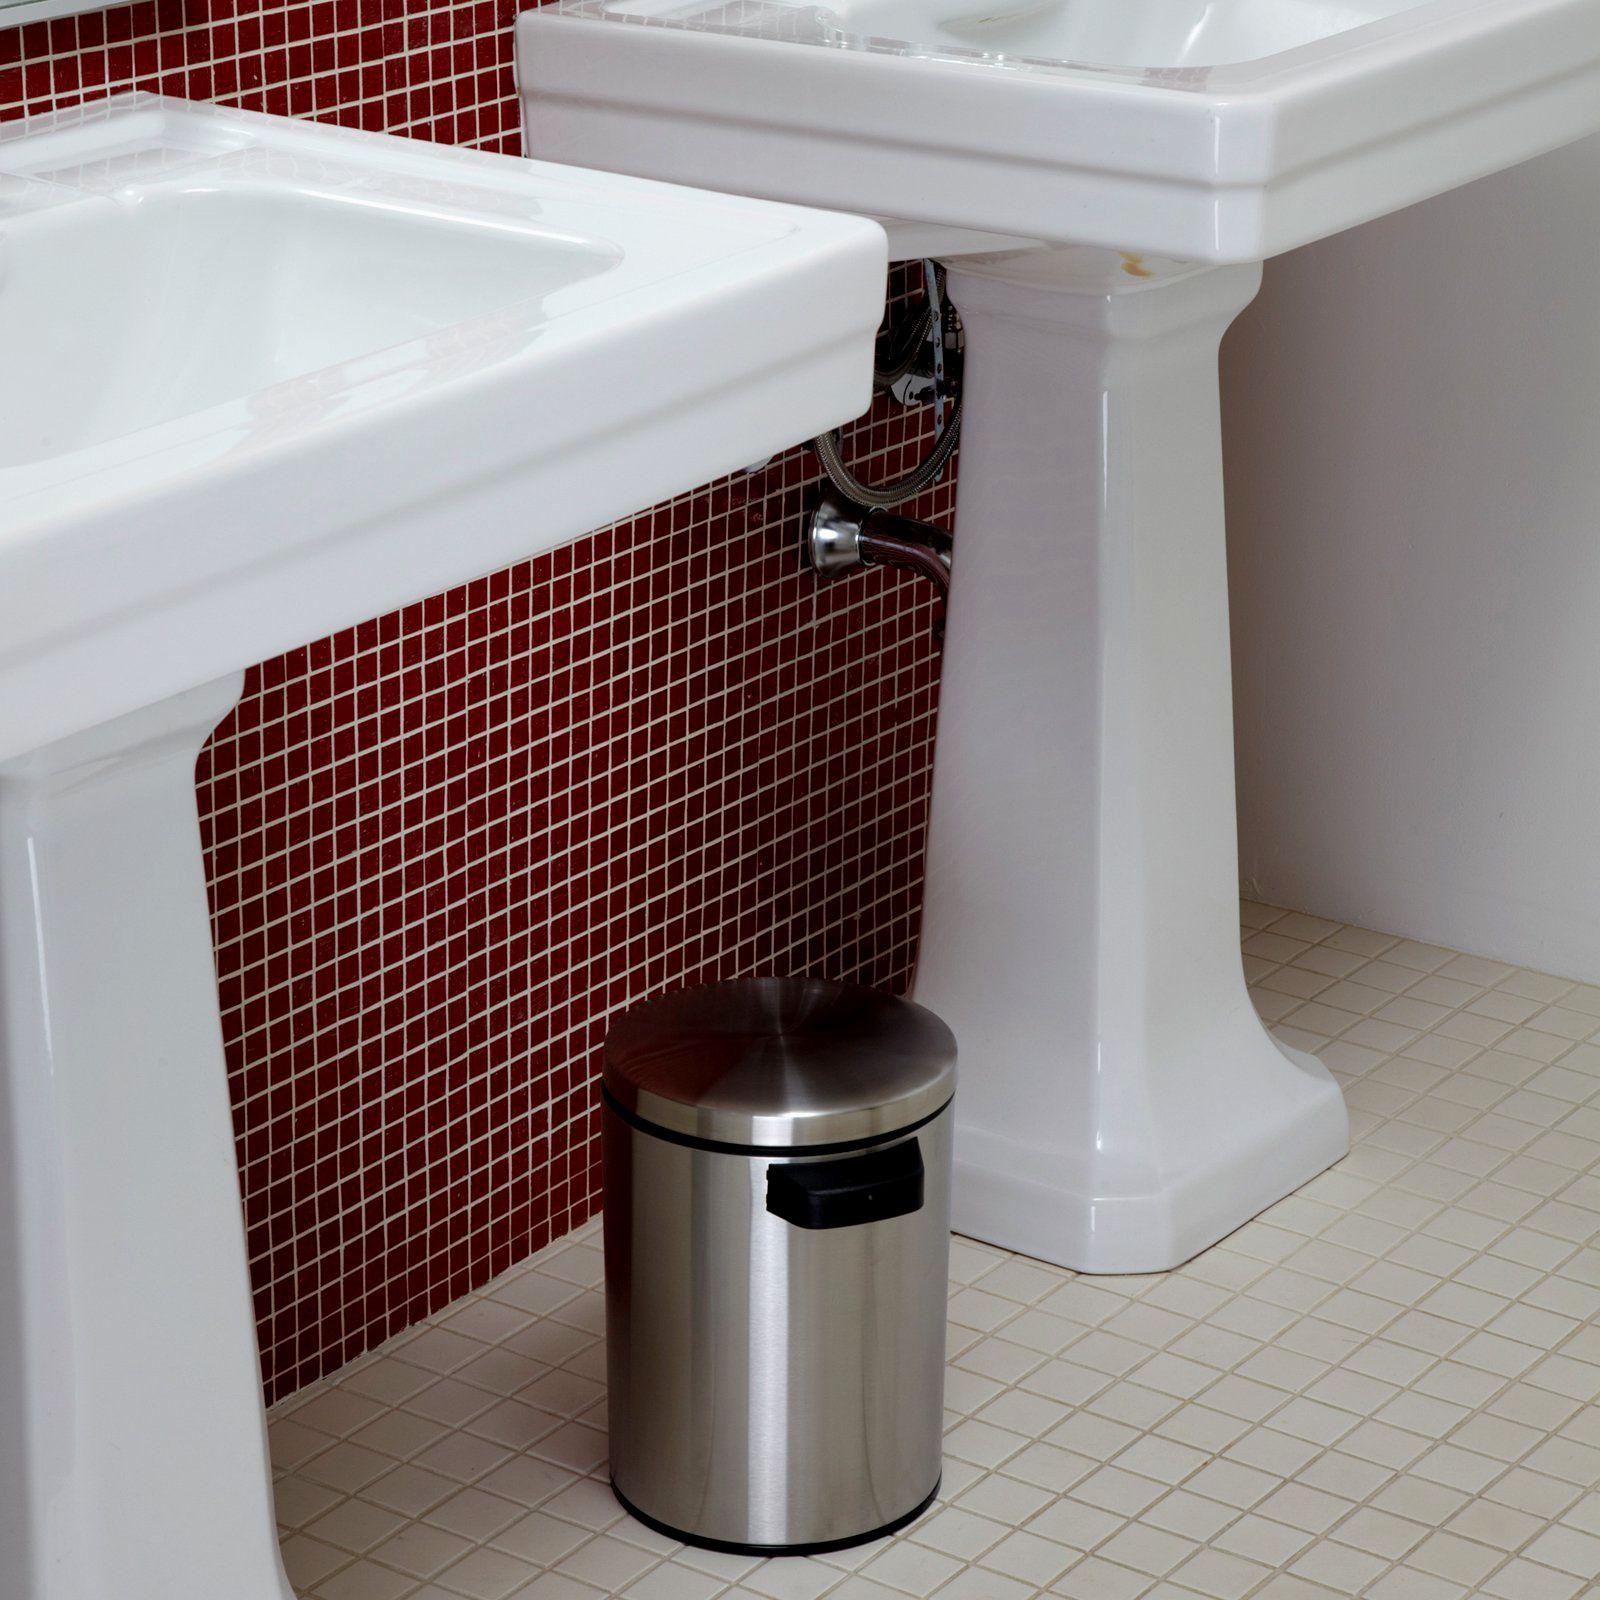 fascinating bathroom trash can ideas-Inspirational Bathroom Trash Can Photo